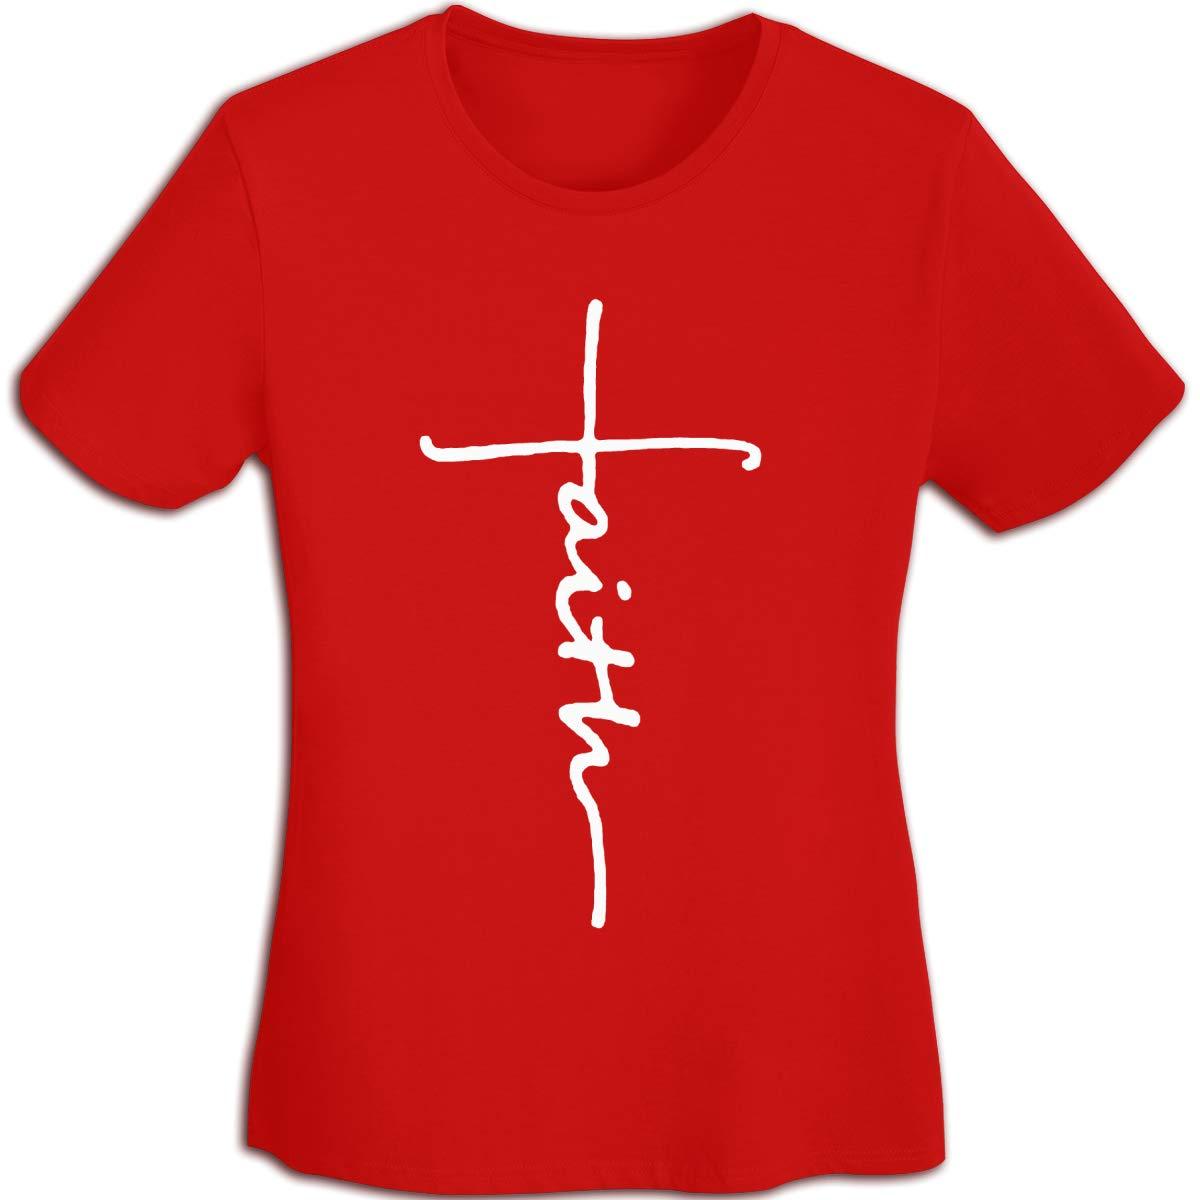 Women's T Shirt Cross Faith Shirts Jesus Tshirts Cotton Christian T-Shirt Short-Sleeve Tshirt for Women Youth Girls Red S by BKashy